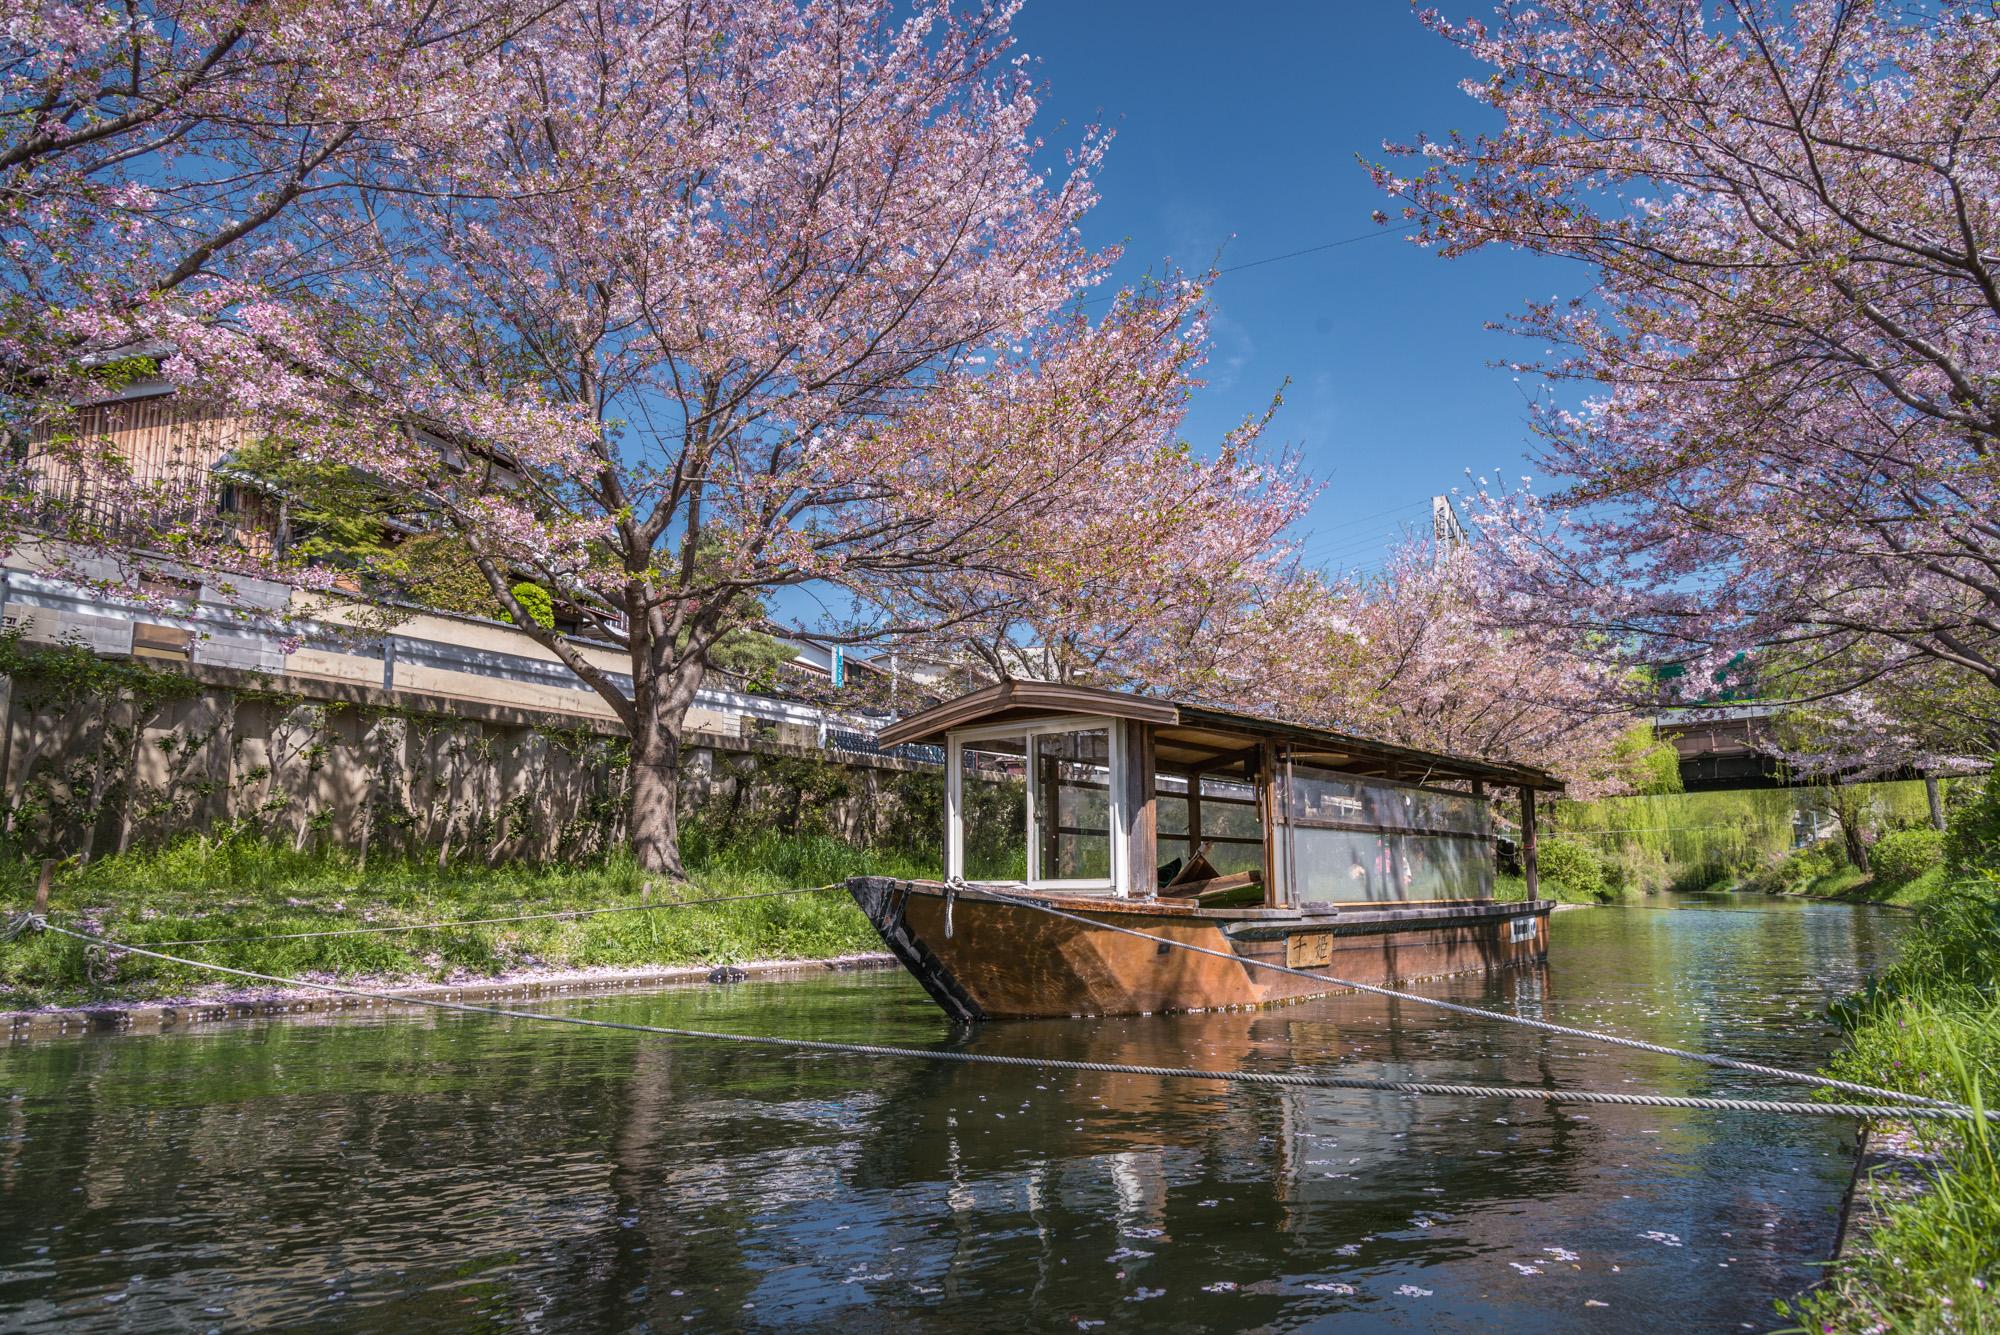 DSC_0356 京都府 中書島 伏見十石舟(桜と船の風情を感じる美しい景色!京都の春におすすめ桜写真スポット! 撮影した写真の紹介、アクセス情報など)